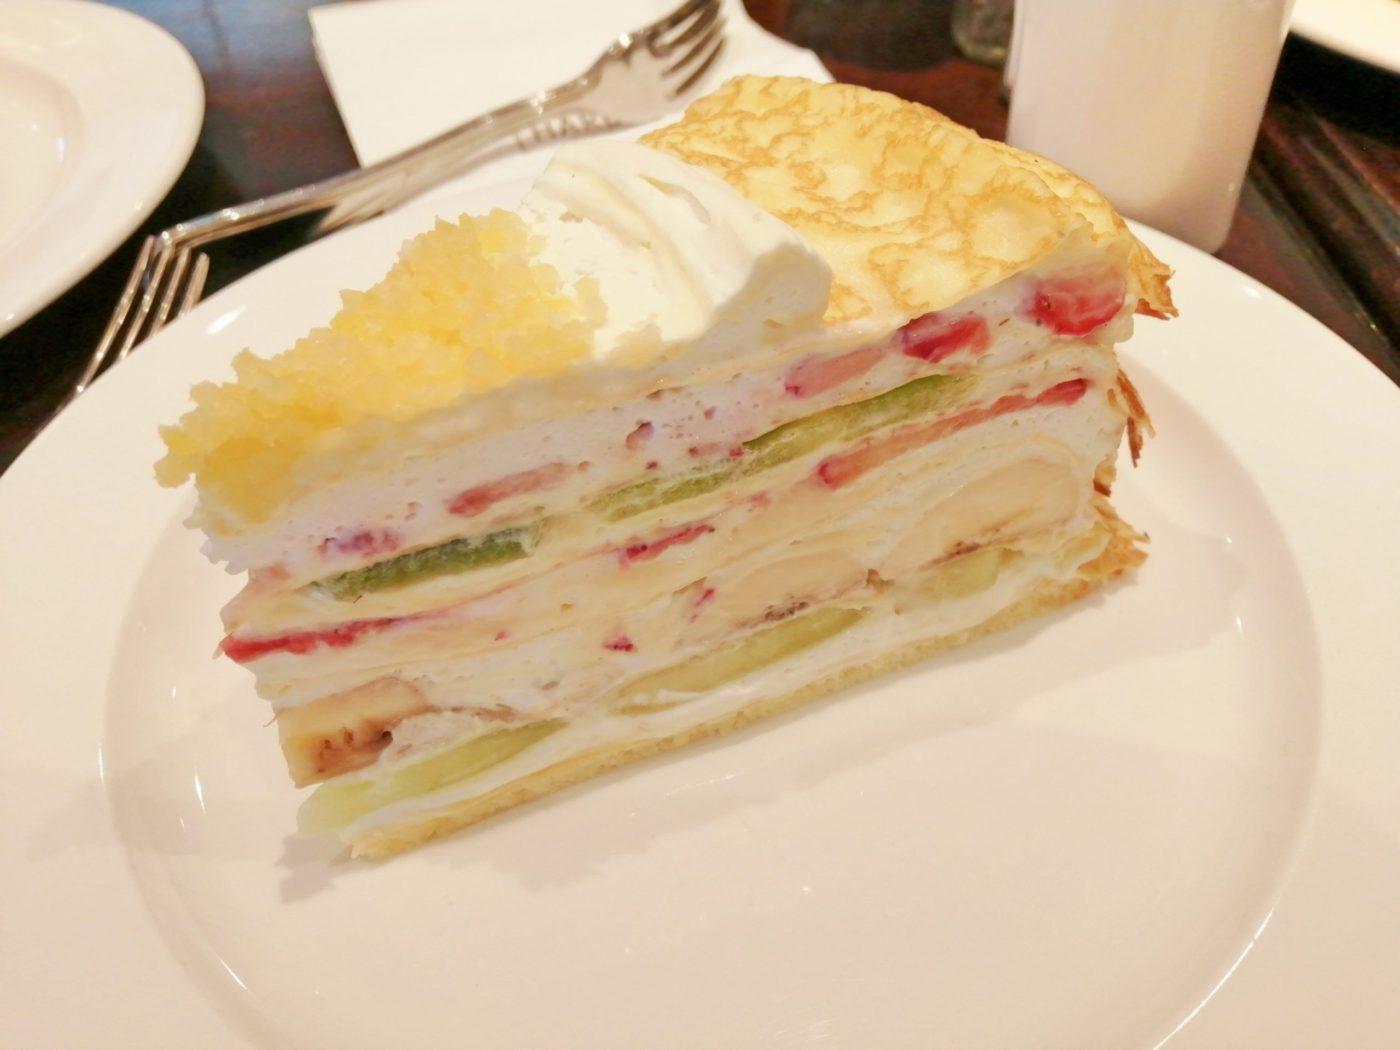 Harbs cake